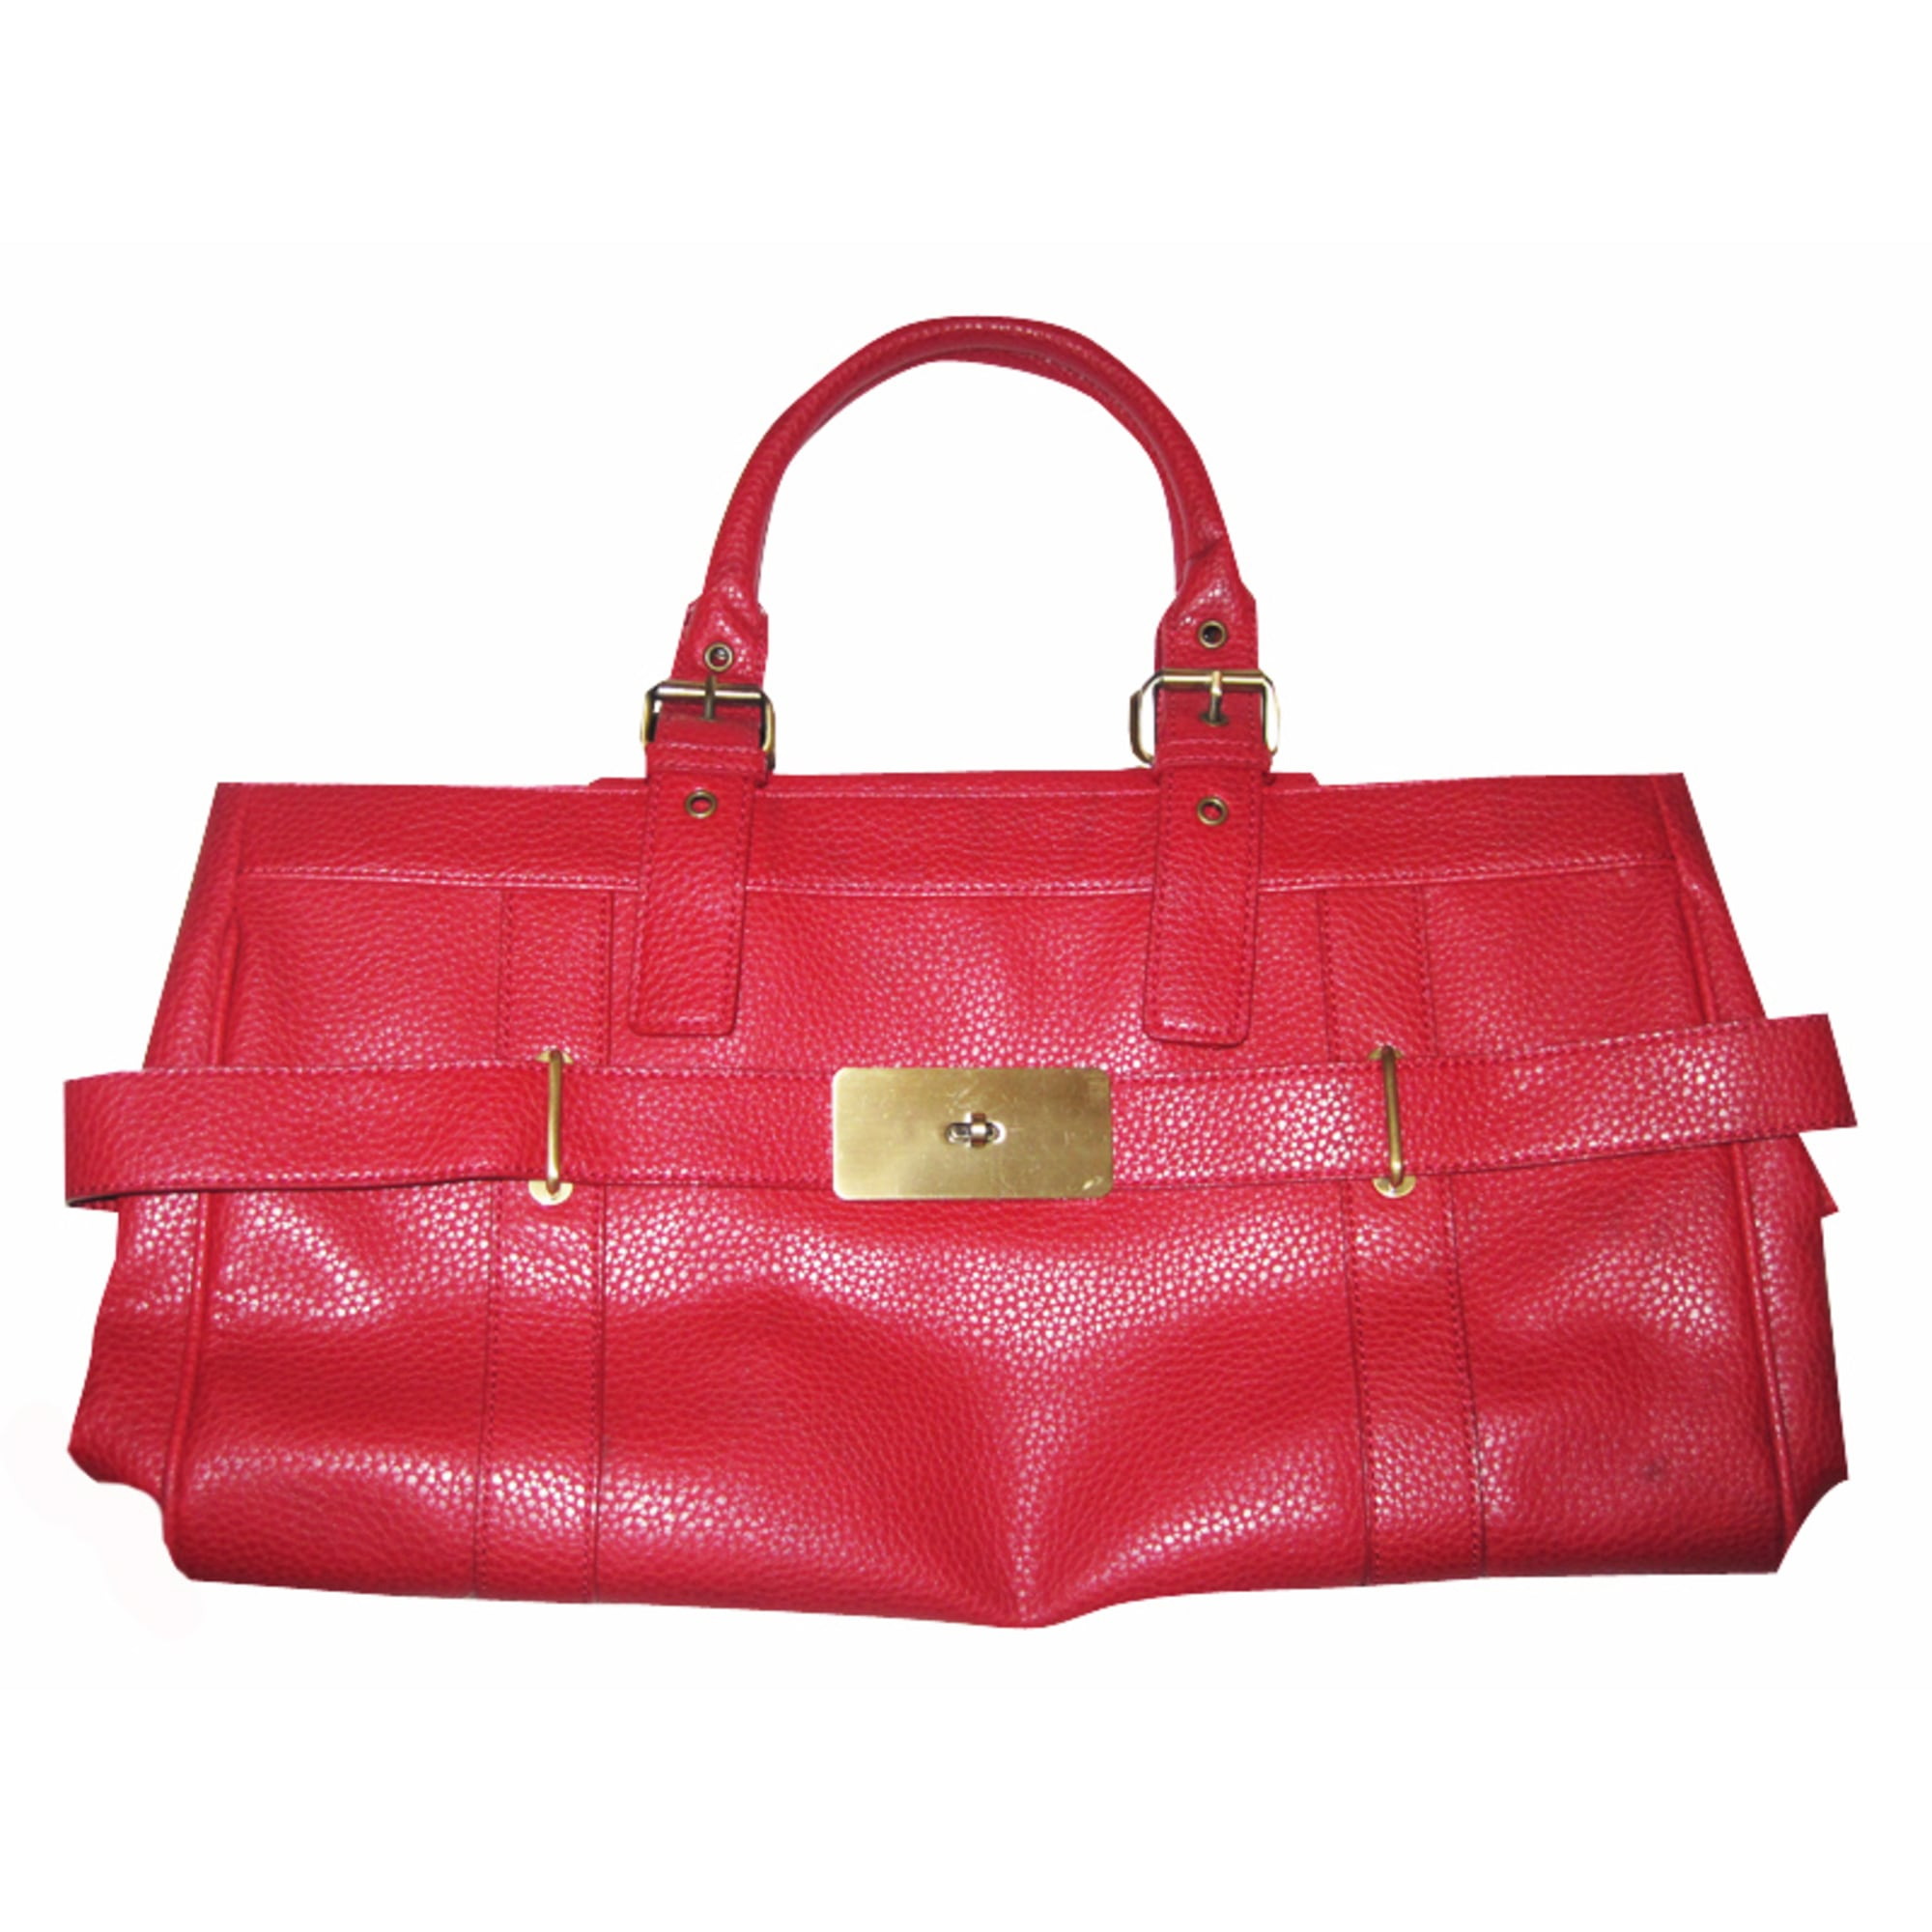 sac main en cuir zara rouge vendu par cat 326679 304299. Black Bedroom Furniture Sets. Home Design Ideas